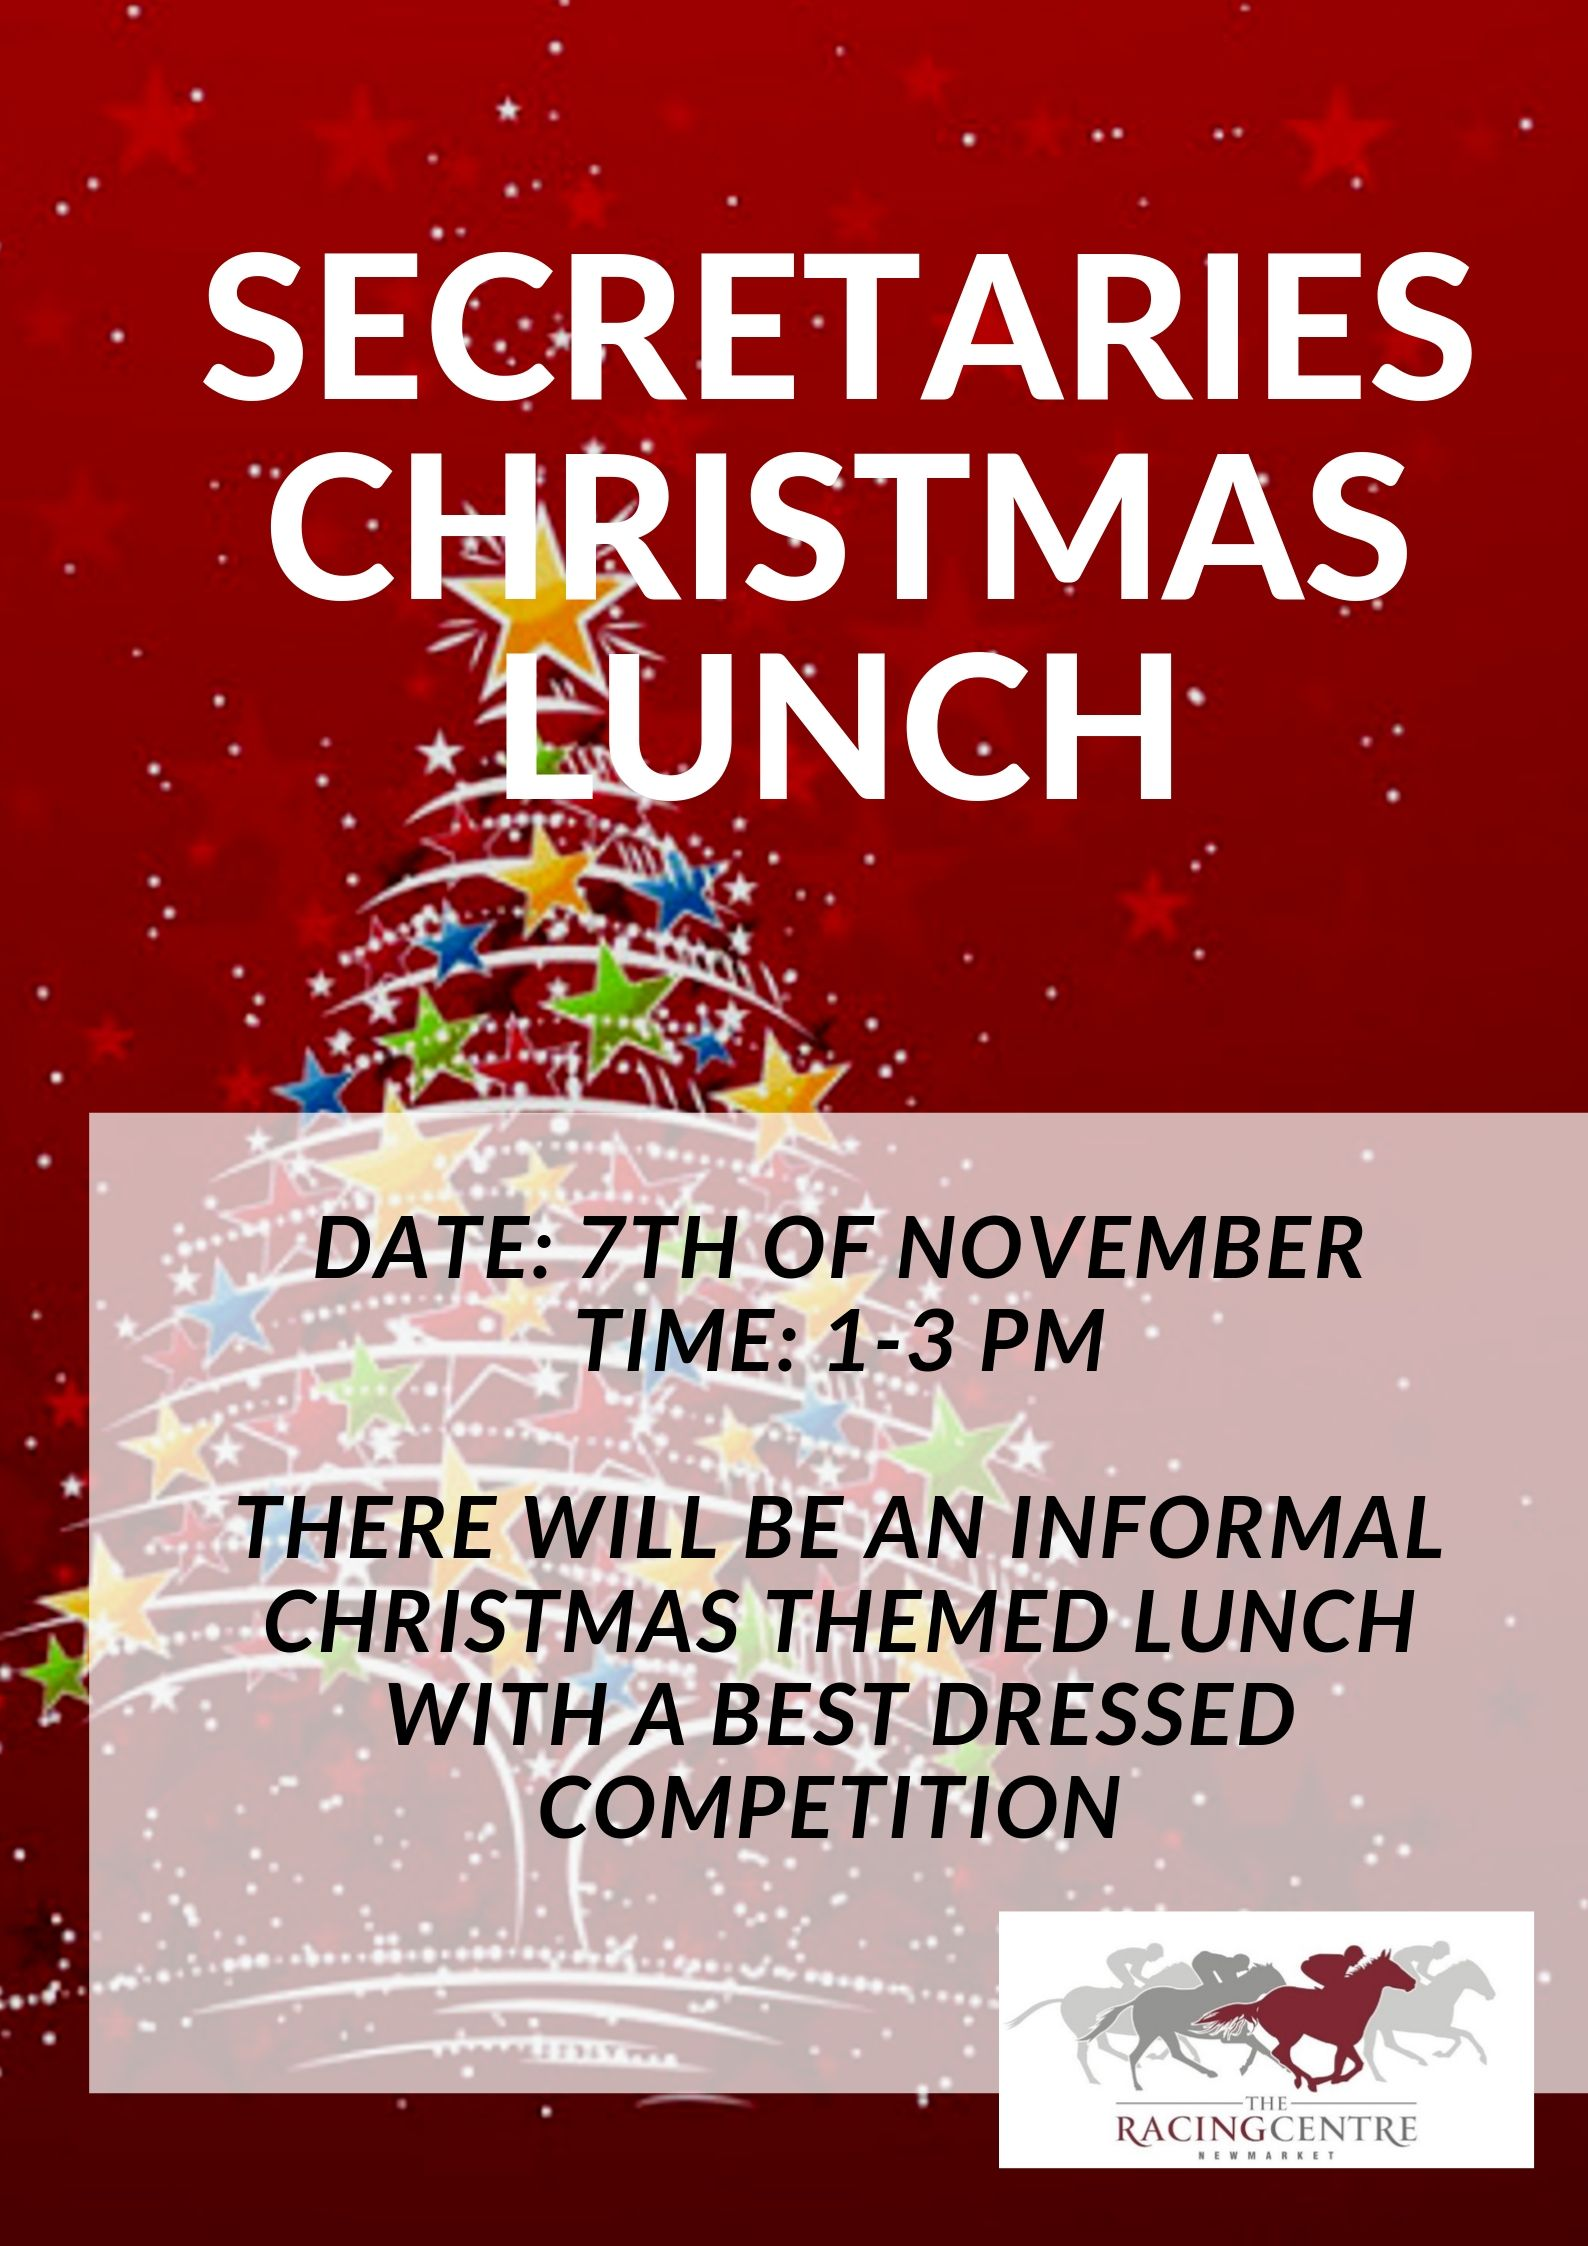 Secretaries Christmas Lunch